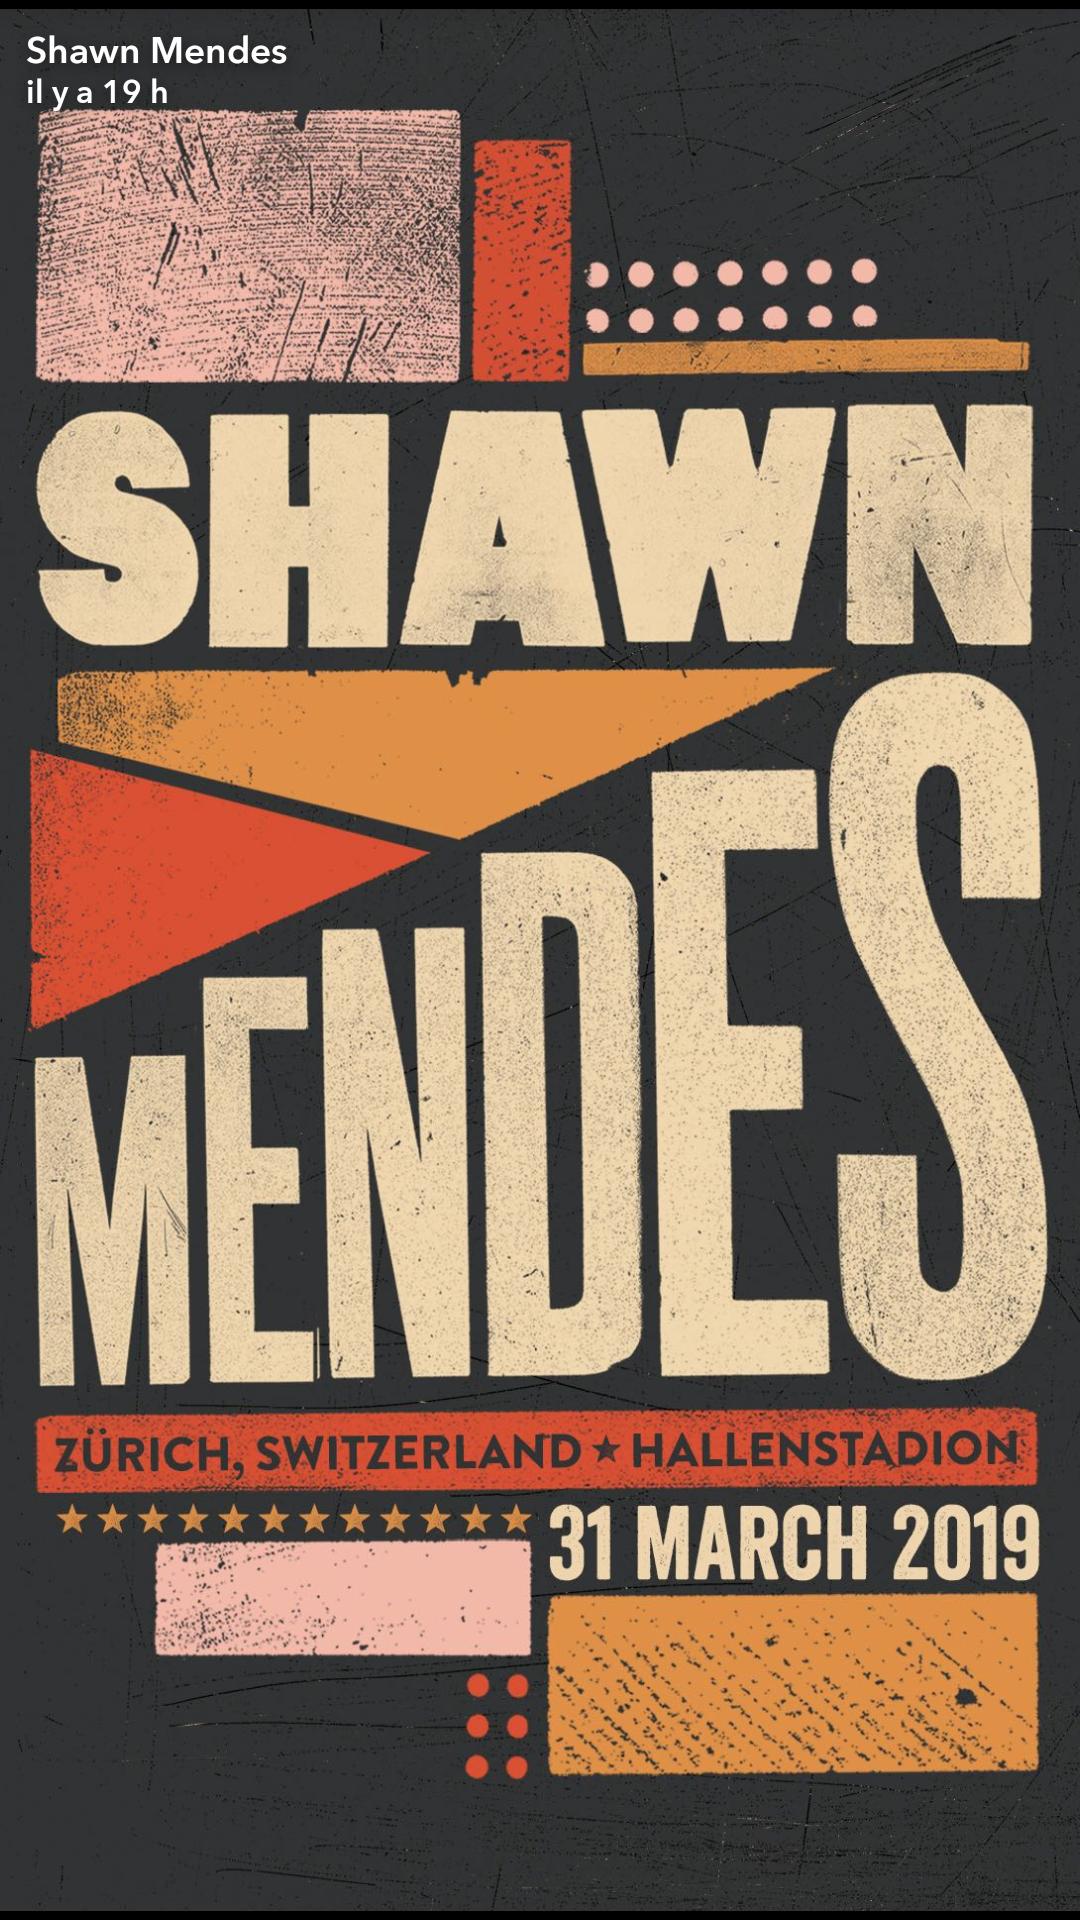 Shawn Mendes Tour Posters Dinding Gambar Gambar Dinding